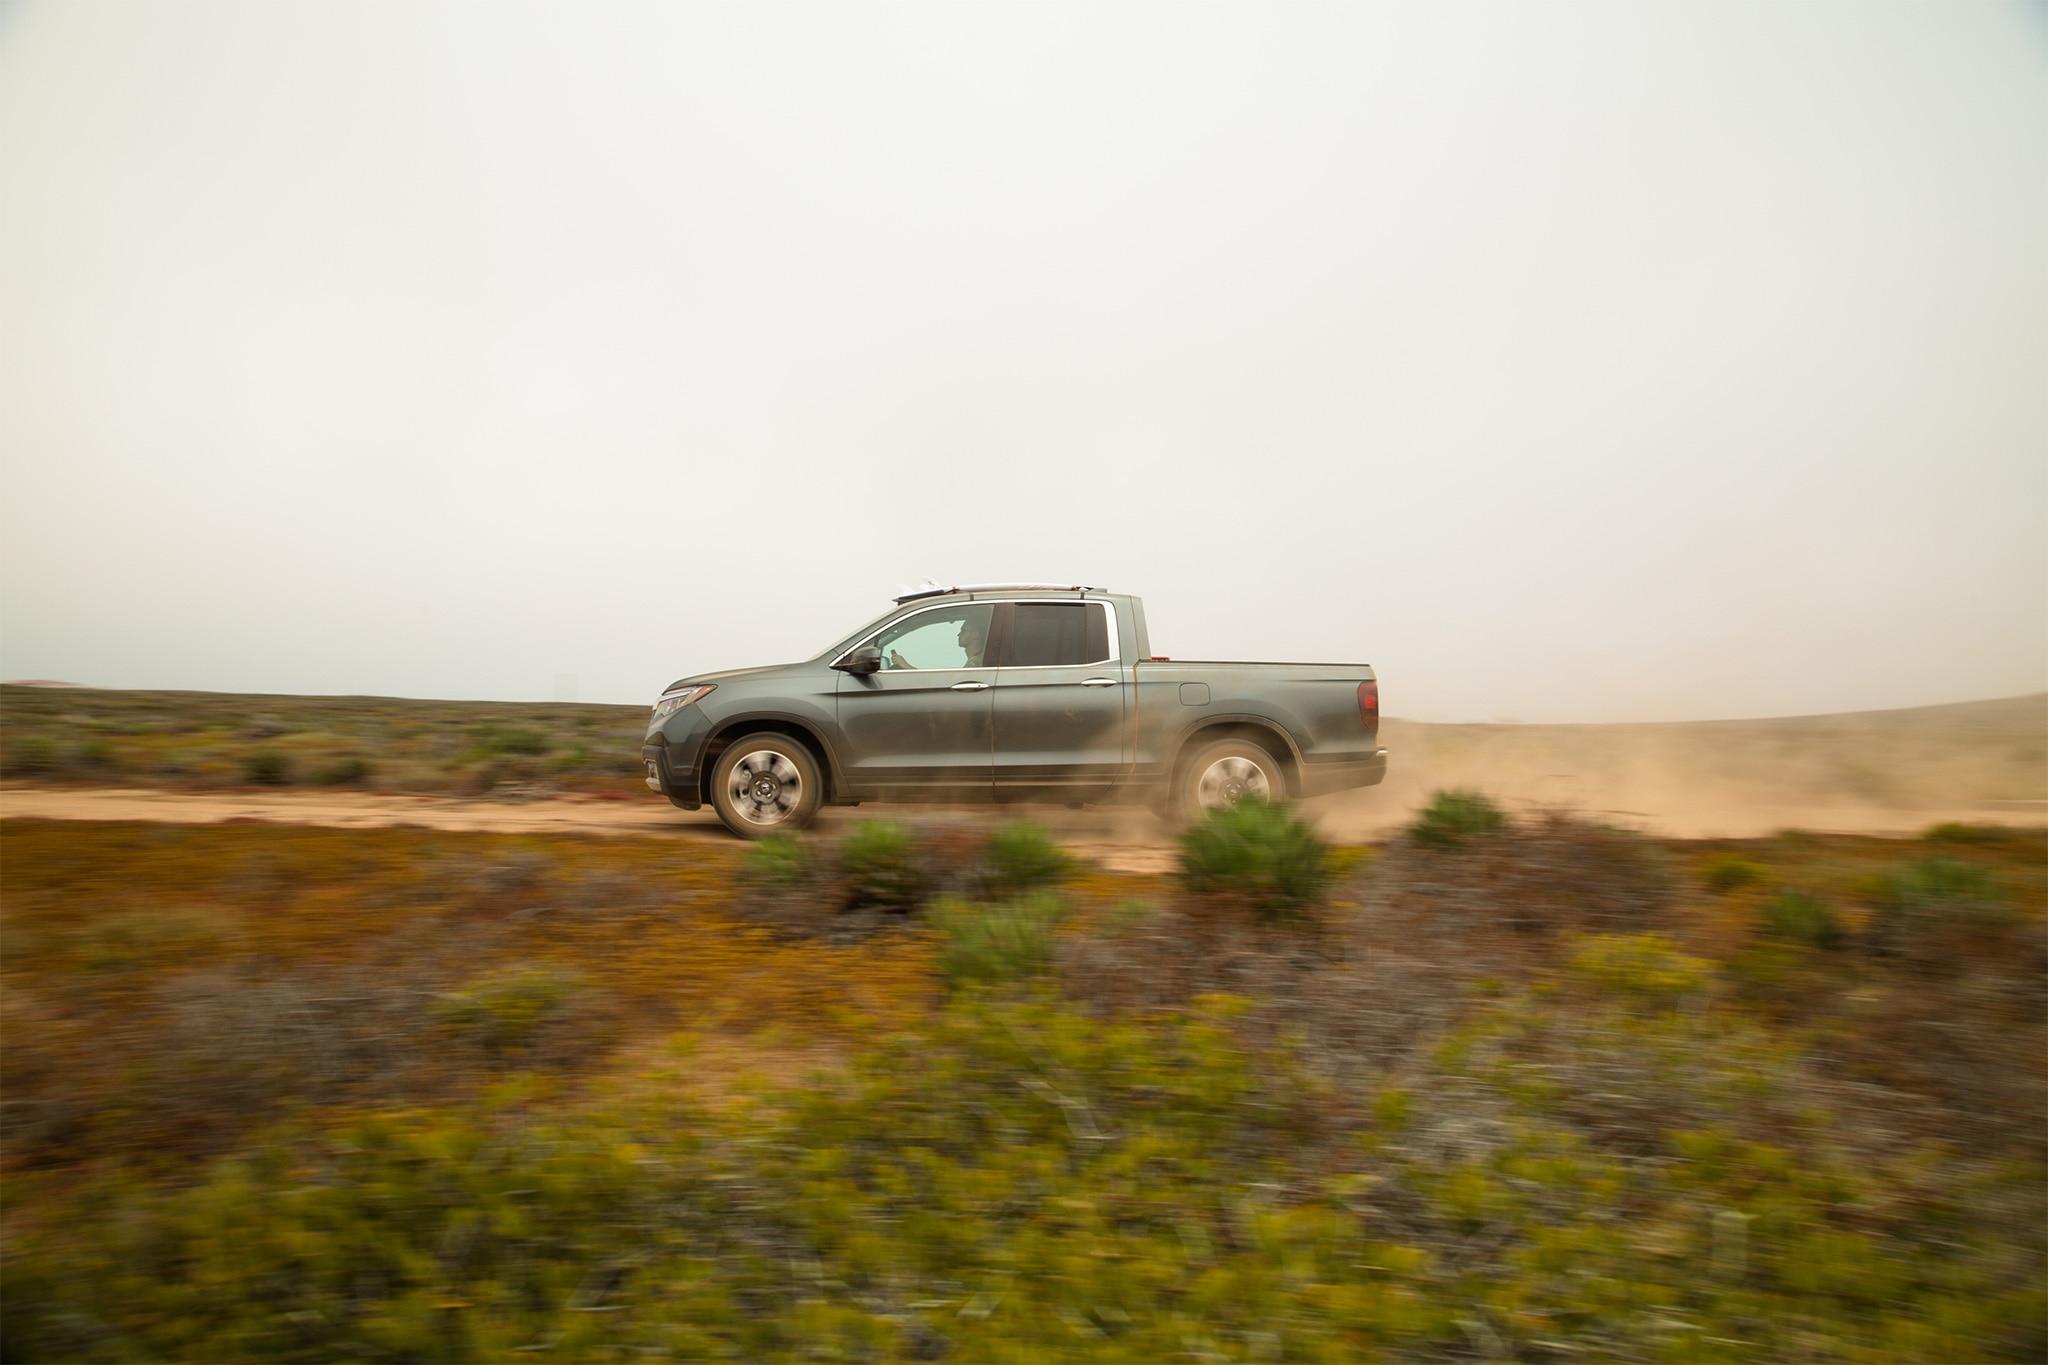 2017 Honda Ridgeline in Baja California, Mexico | Automobile Magazine